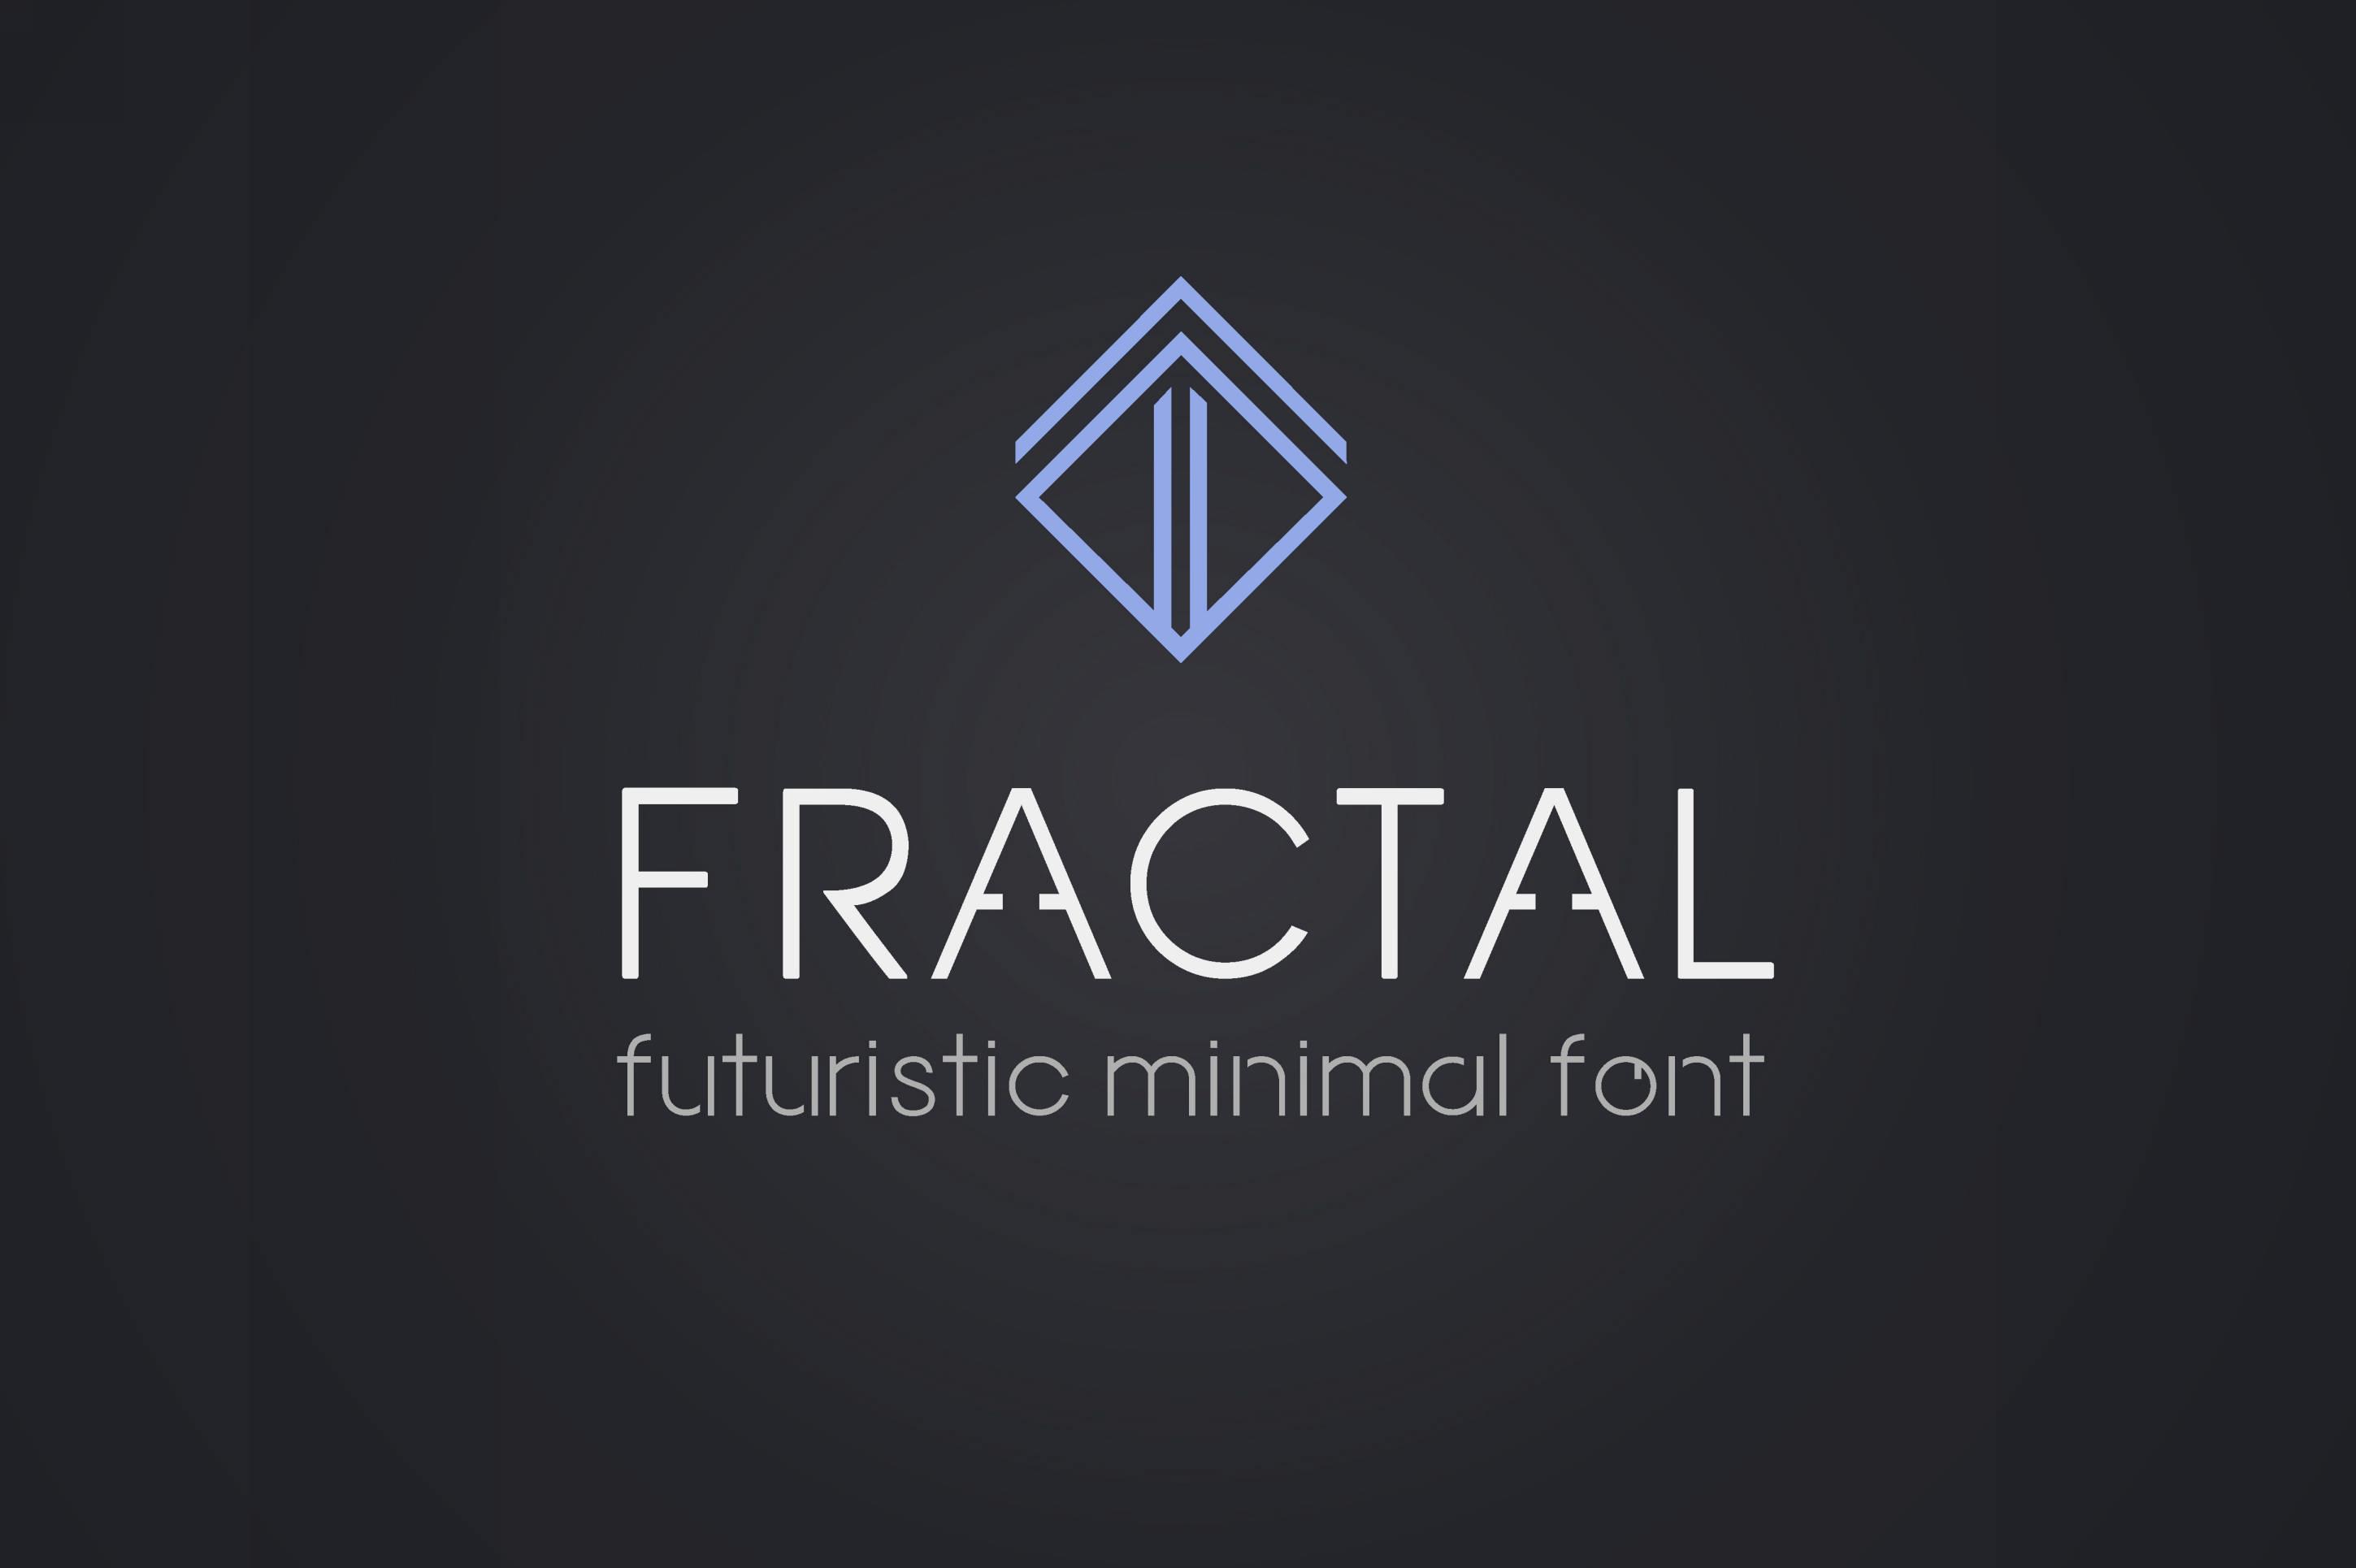 Fractal - futuristic minimal font example image 1